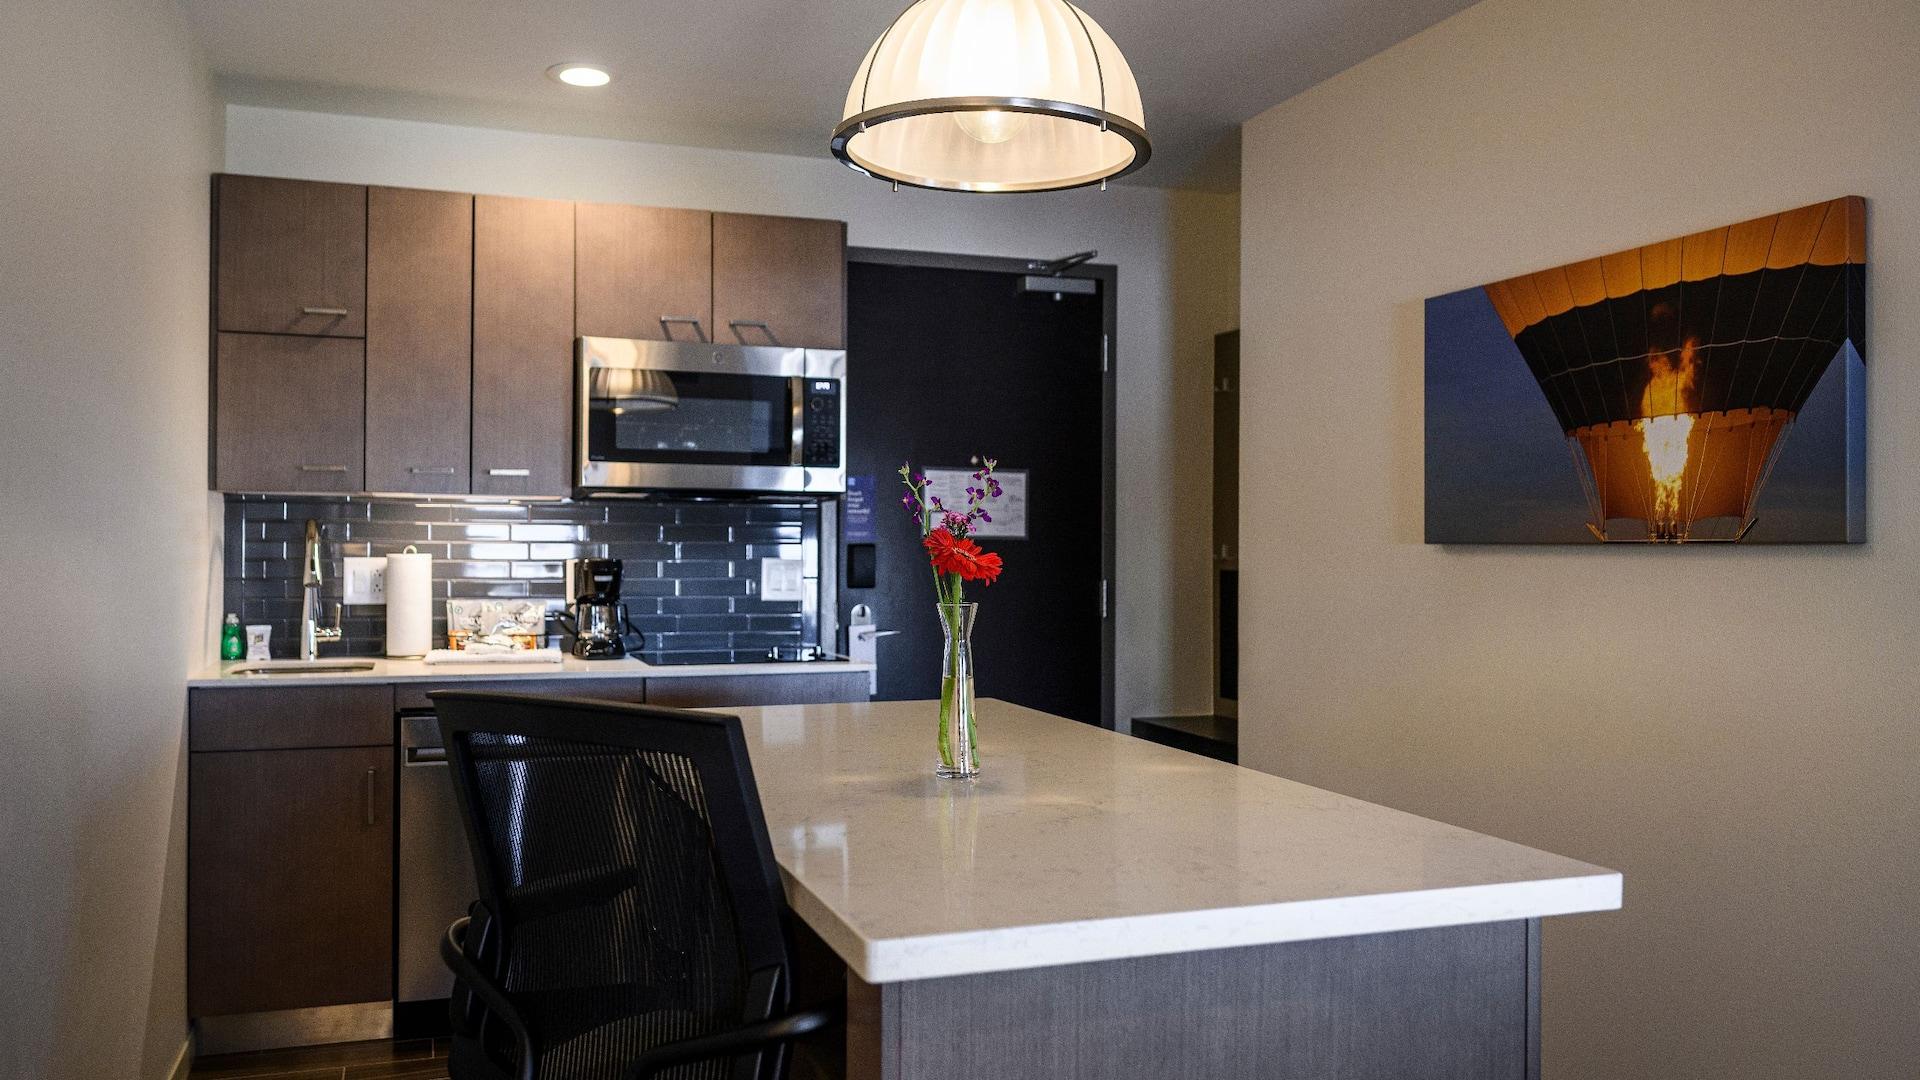 Hyatt House One Room Suite King